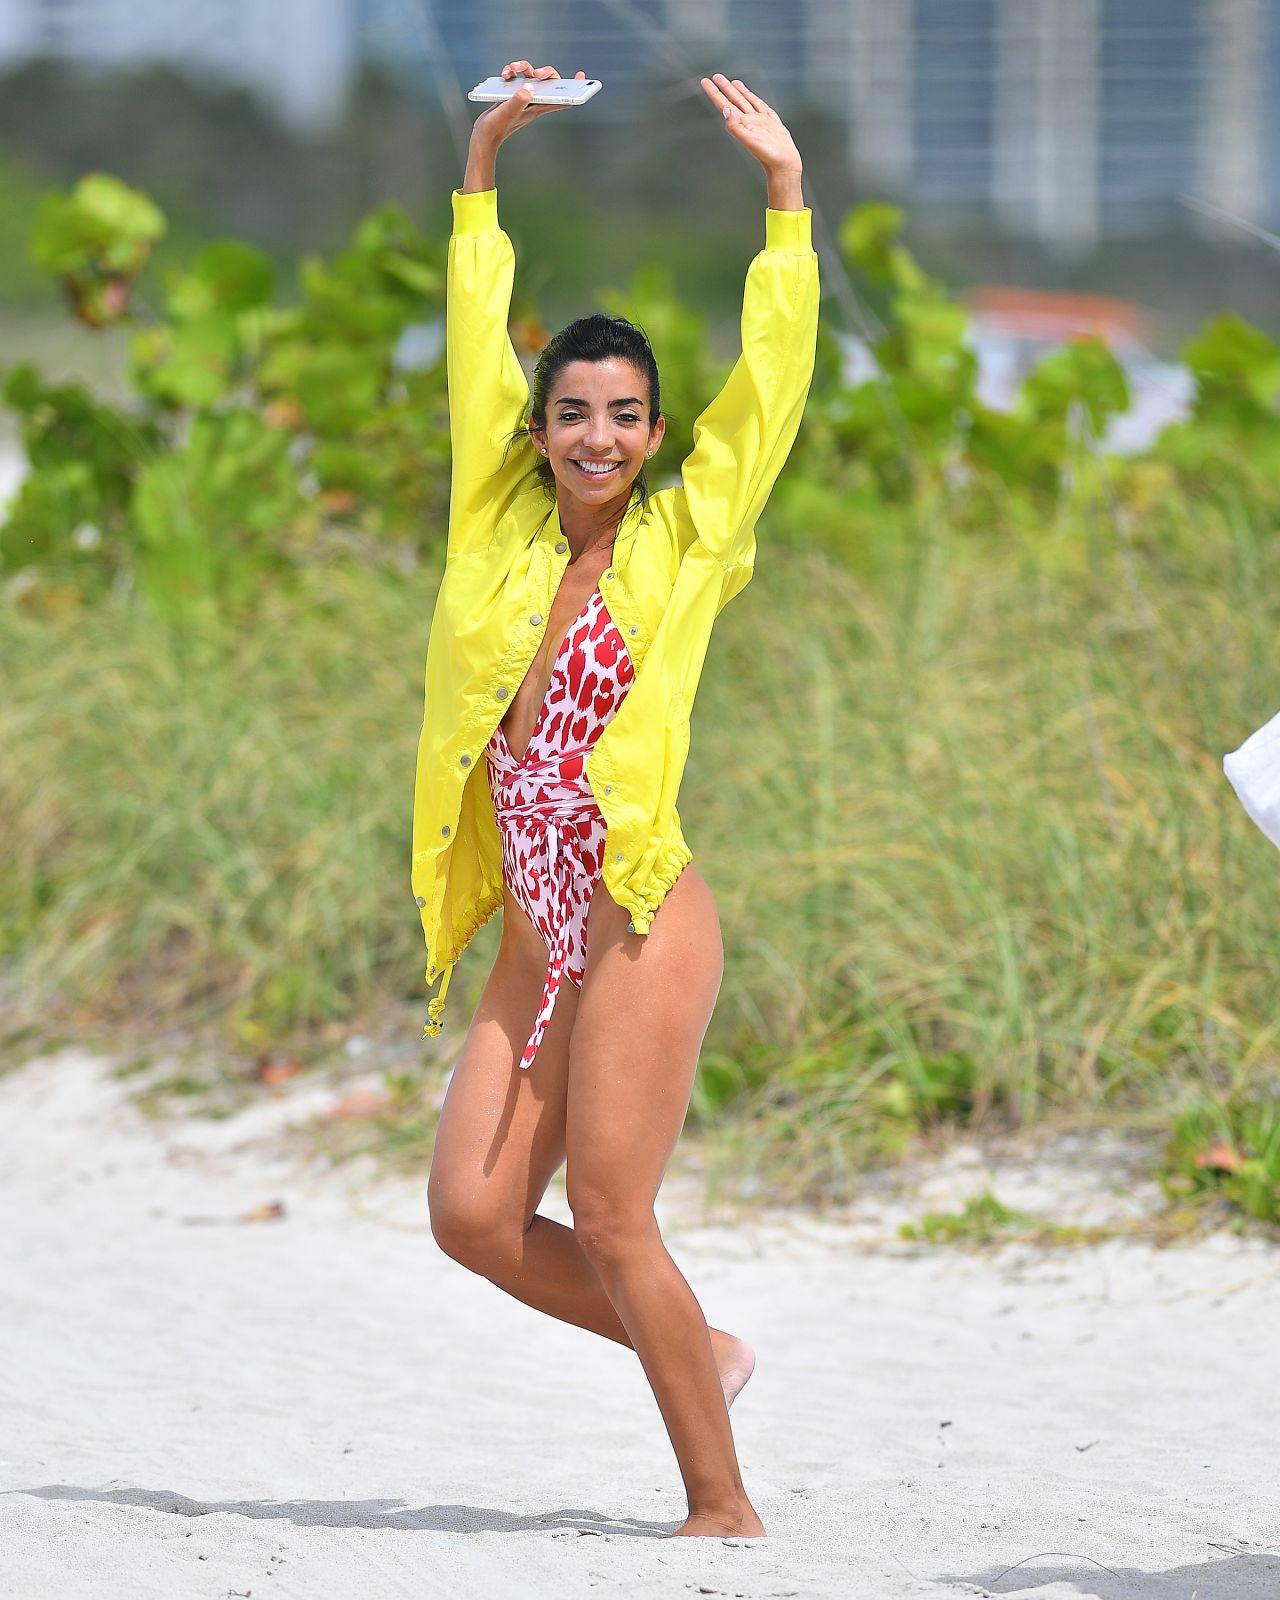 From Miami TV Show Girls In Bikinis On Miami Beach 03/13/2019